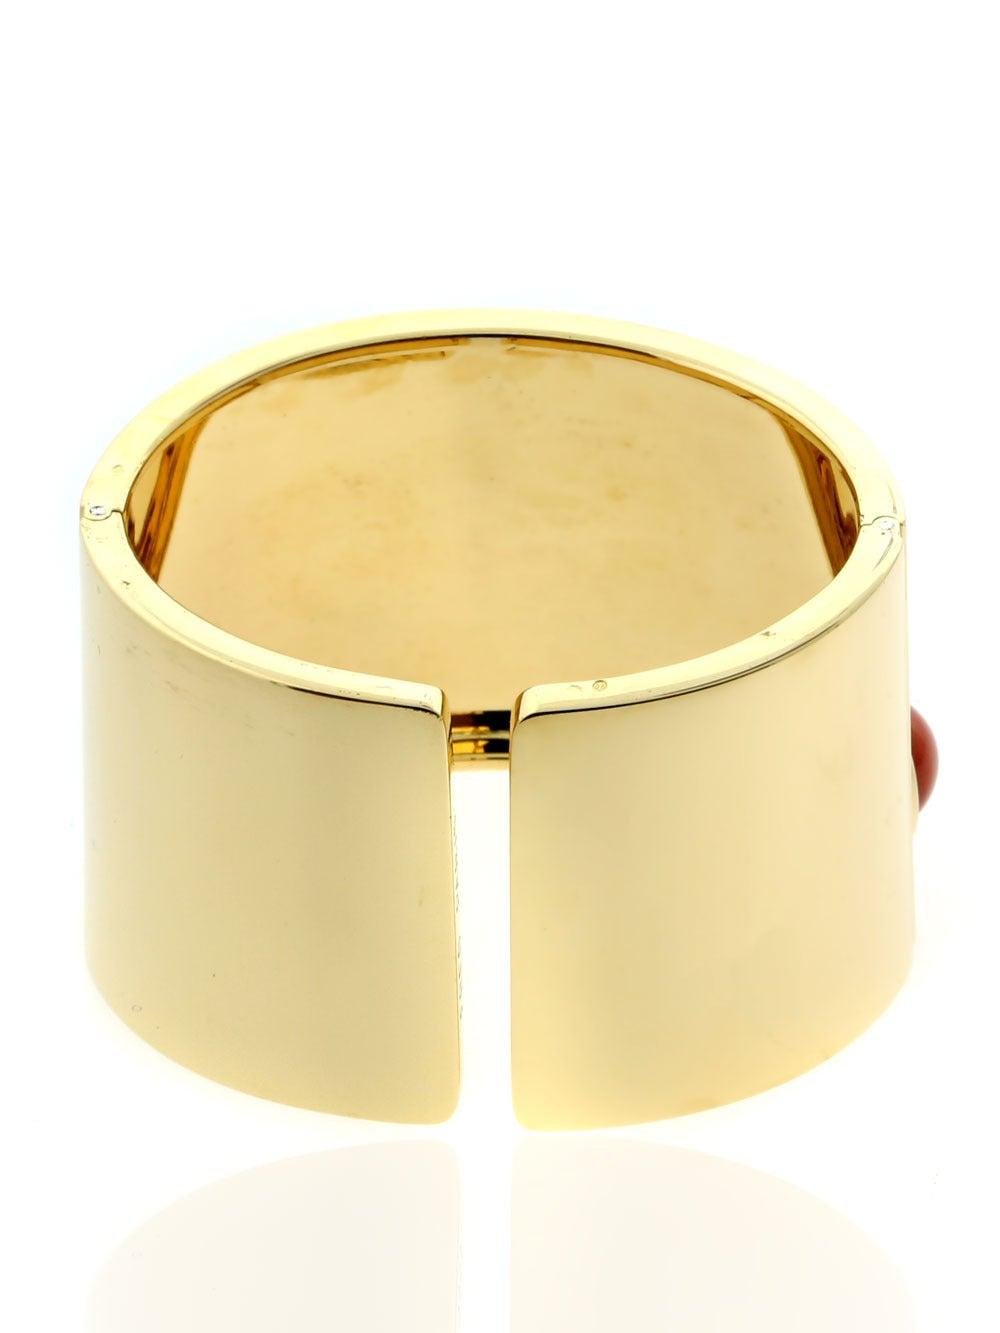 Fred of Paris Coral Gold Arm Cuff Bracelet  5